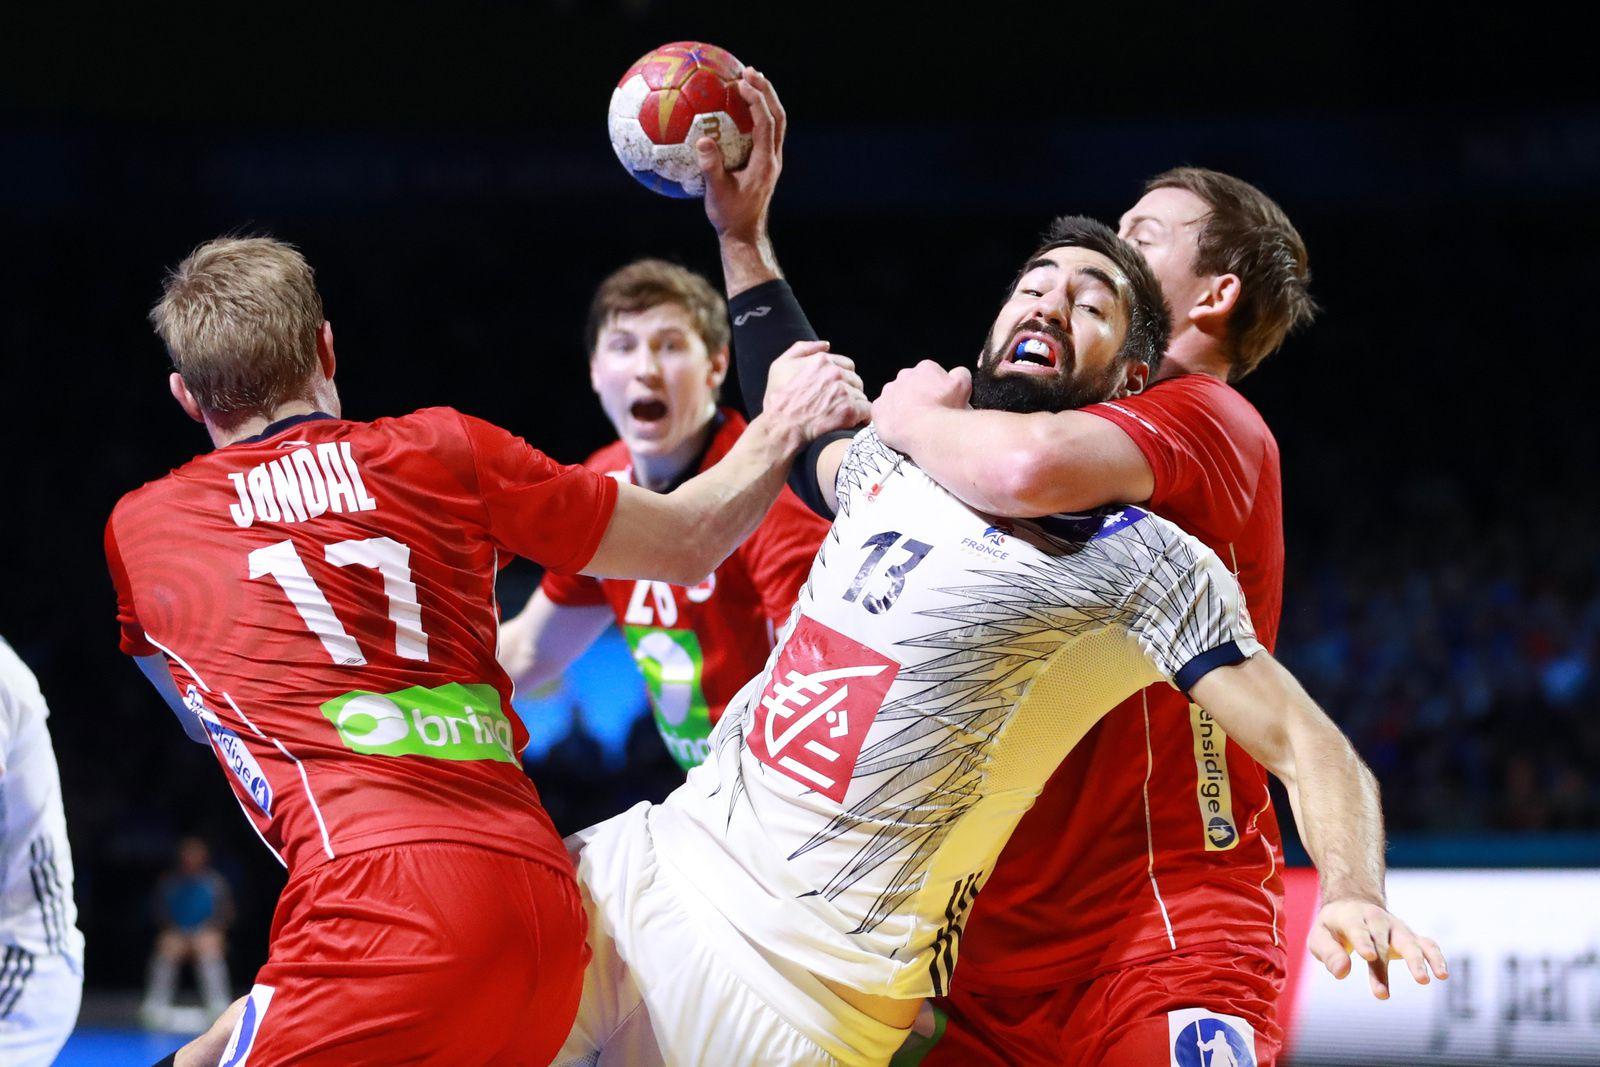 Nikola Karabatic et l'Equipe de France de Handball, soutenus par INDIBA depuis 2012 - crédit photo/S.Pillaud